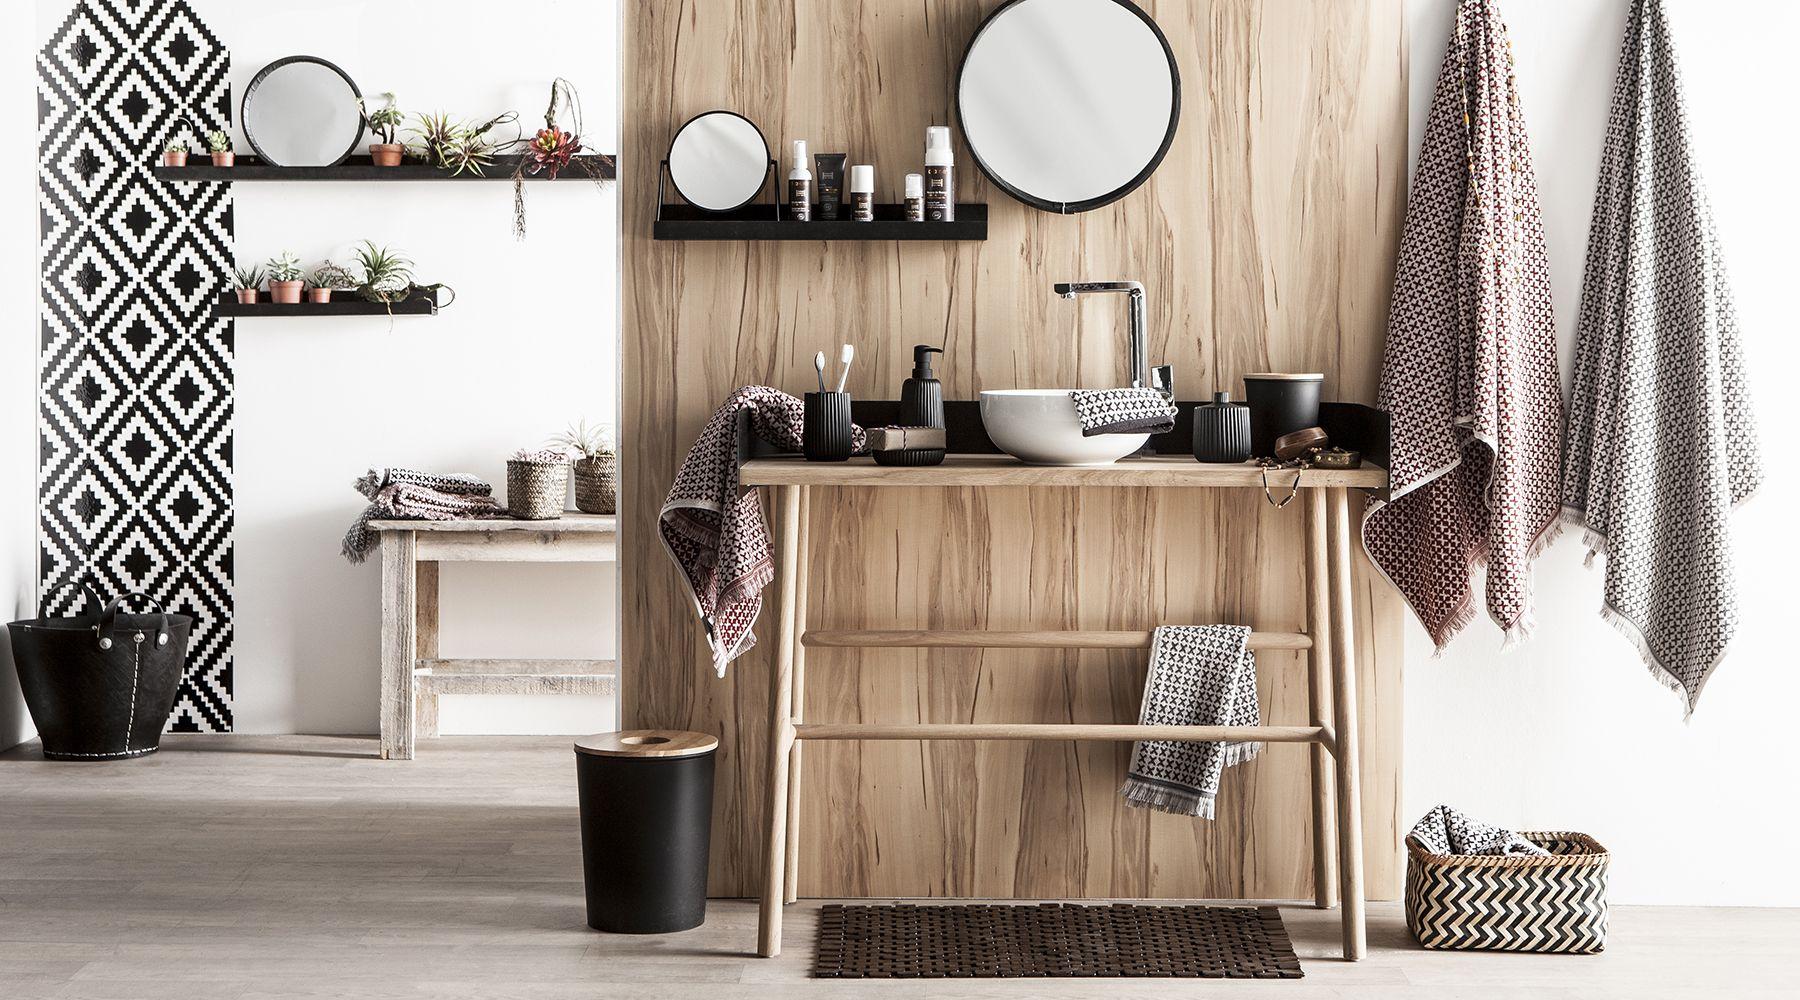 la salle de bain zodio d coration sdb bain baignoire id es d tails la salle de bain. Black Bedroom Furniture Sets. Home Design Ideas